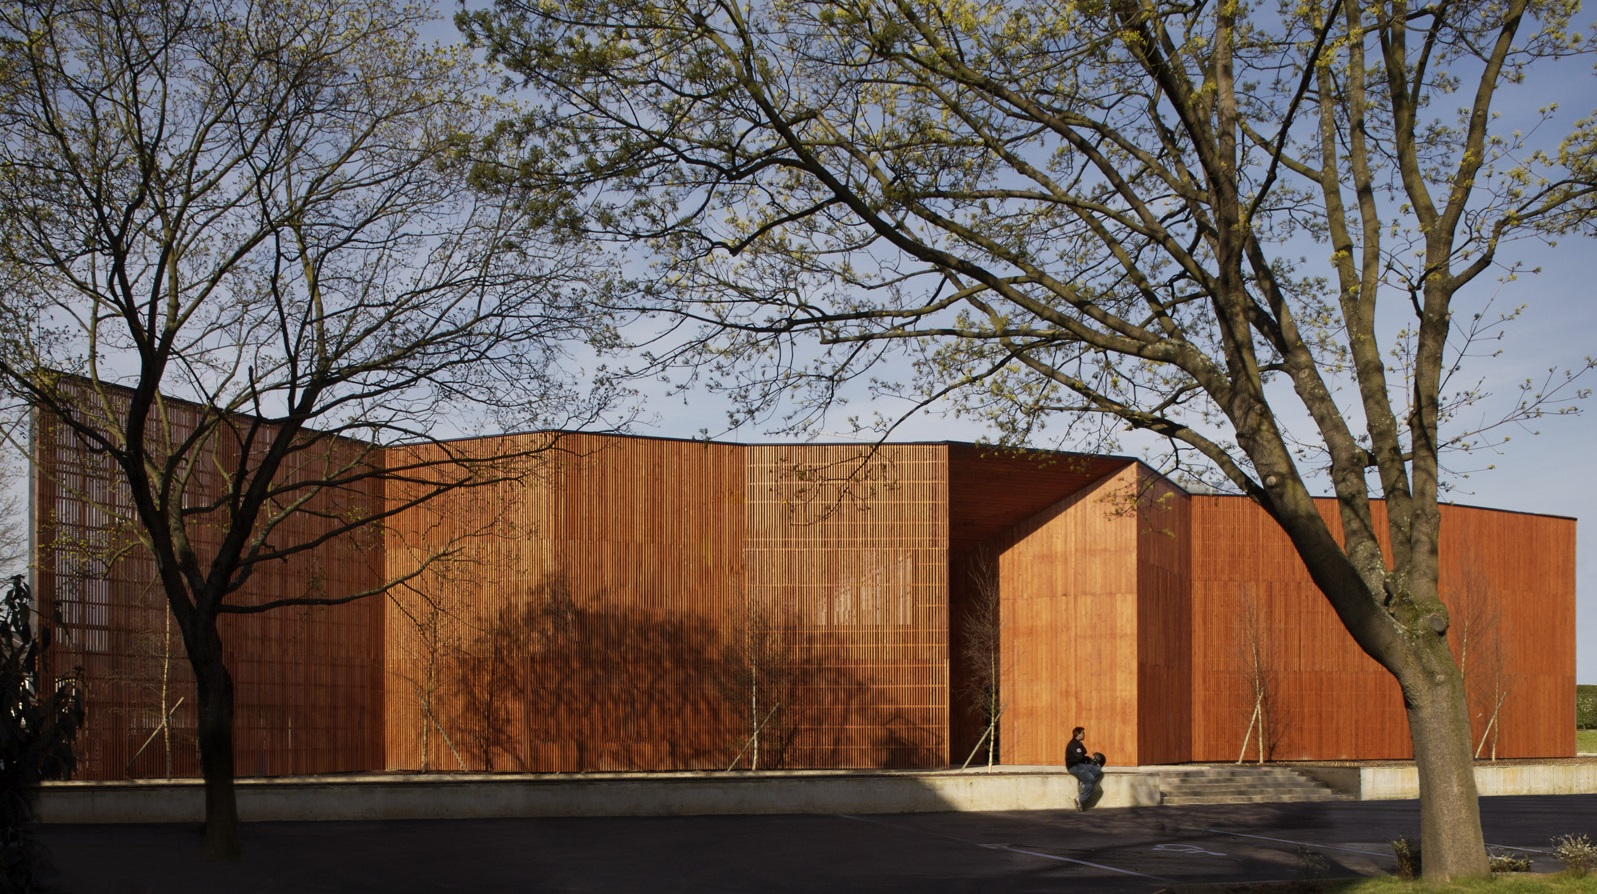 Facade du centre culturel de Massy